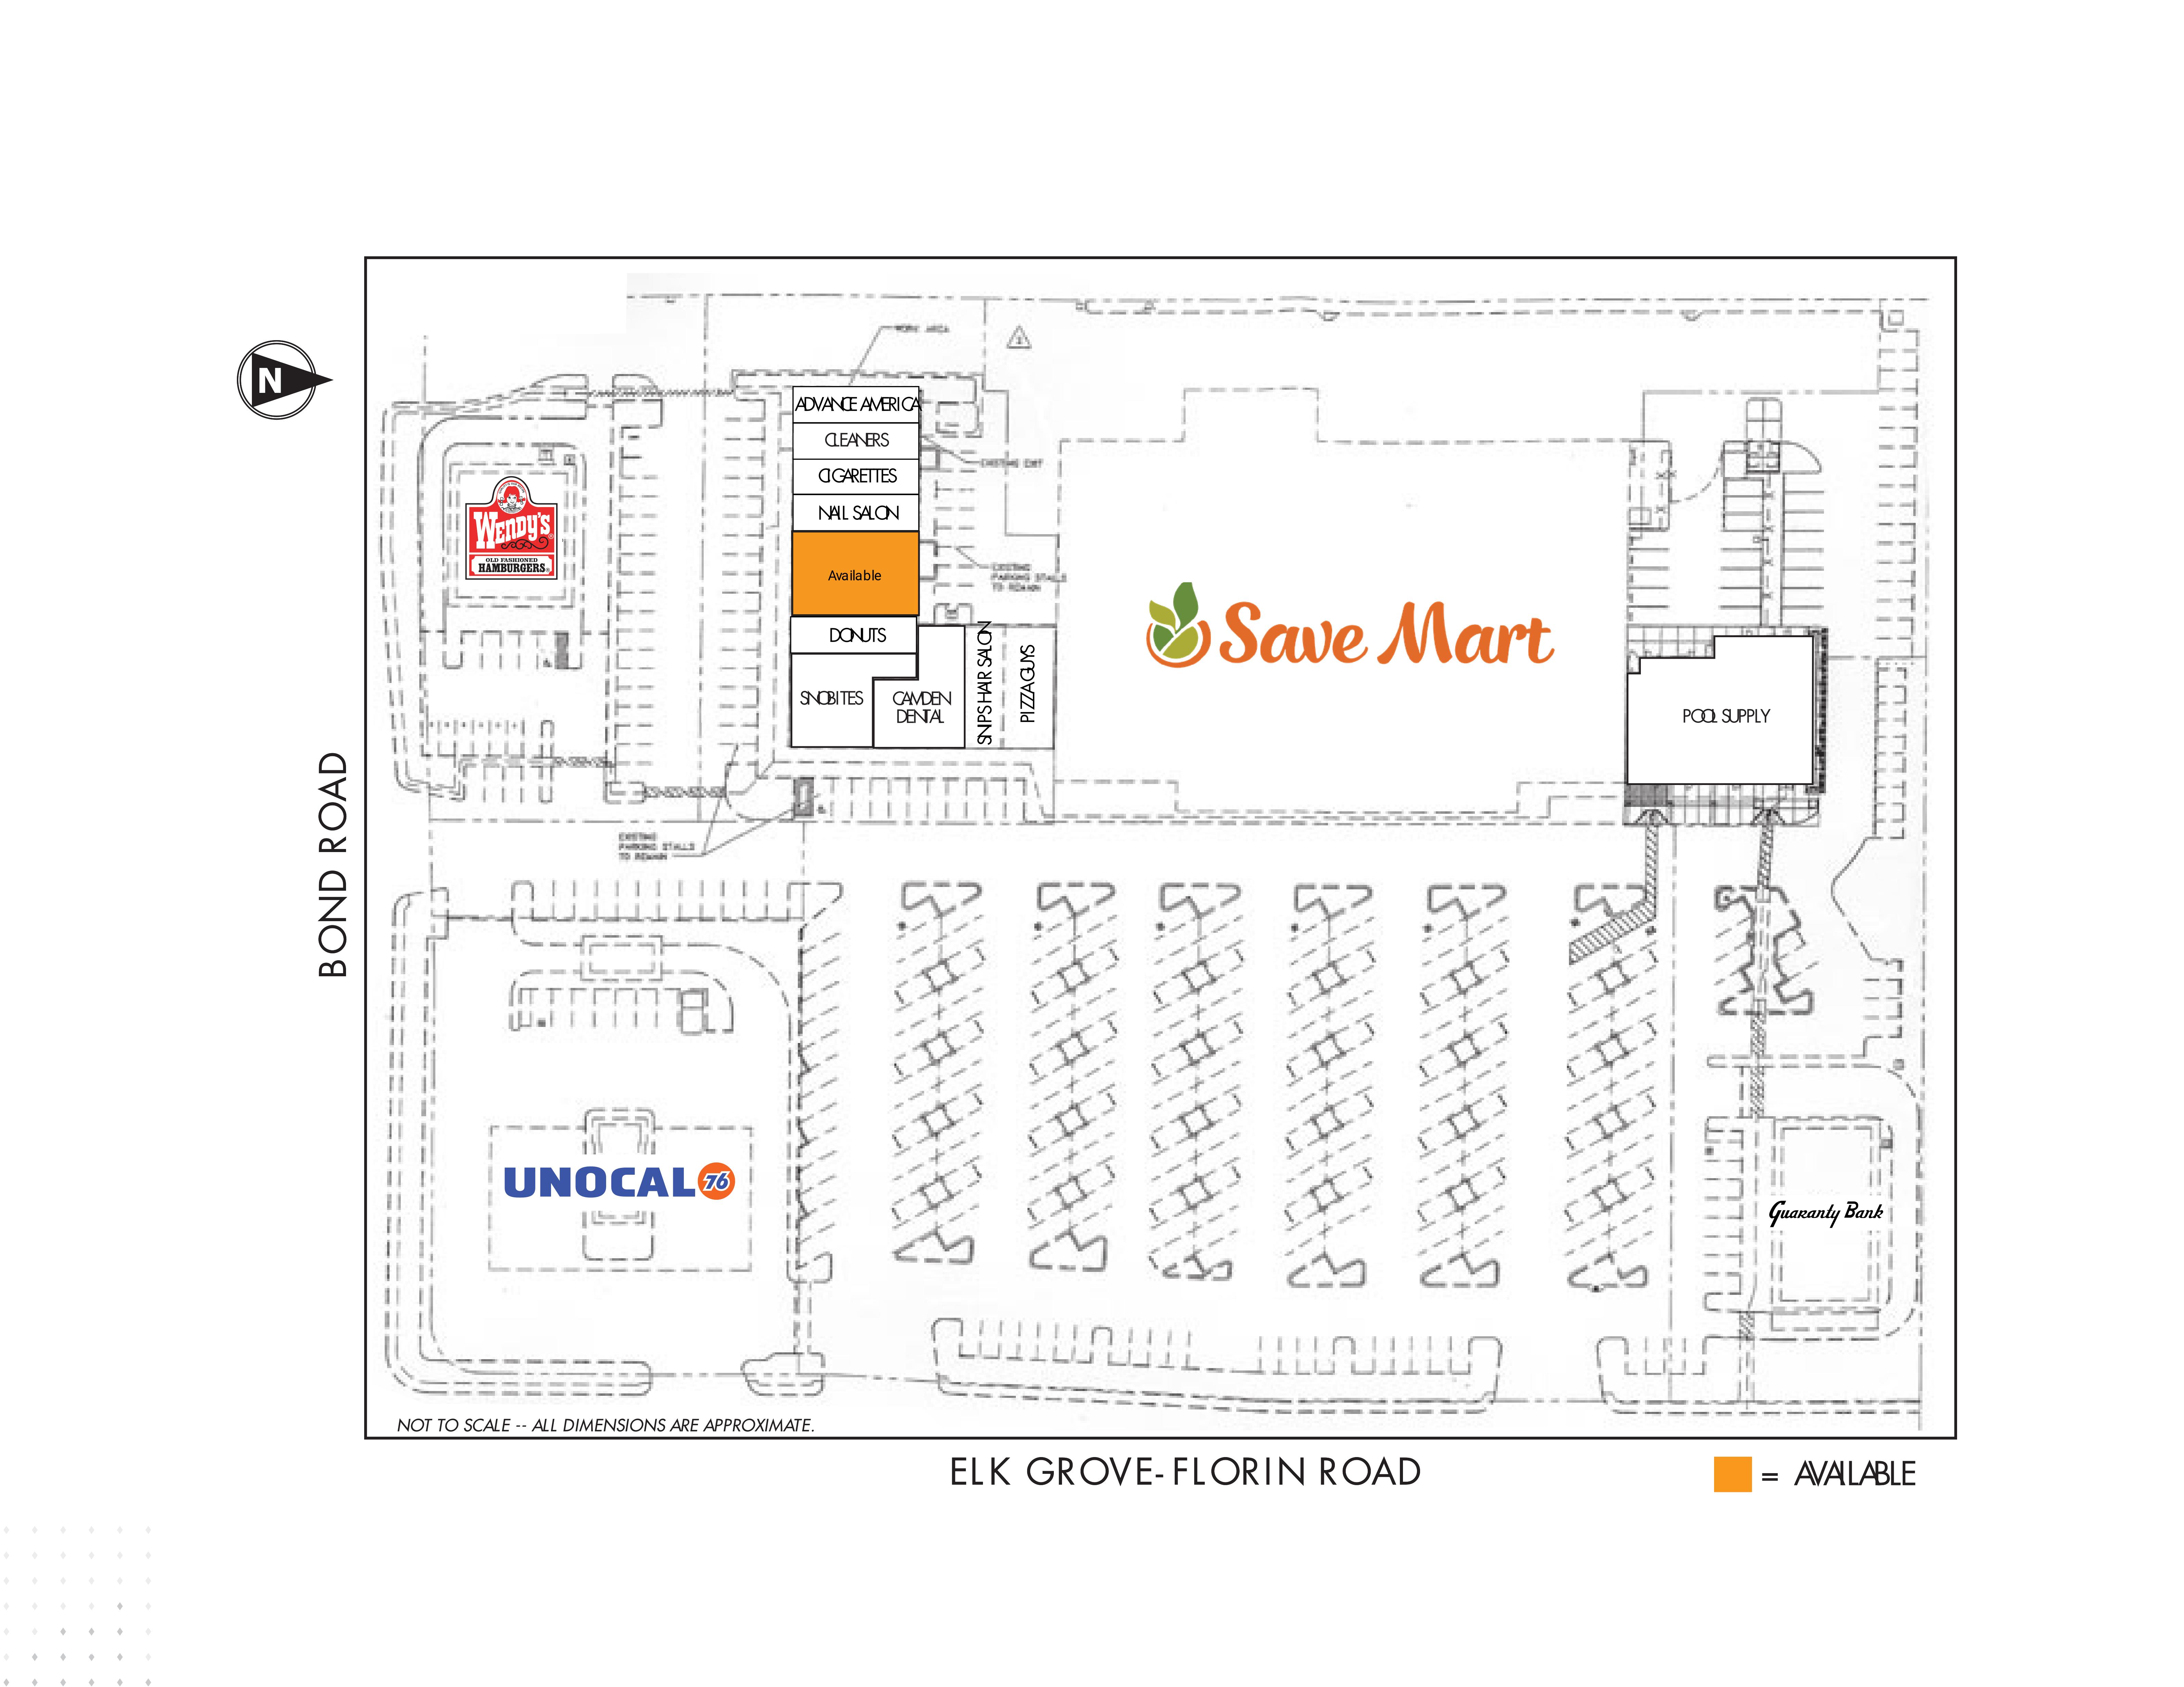 Elk Grove Camden Park Shopping Center: site plan